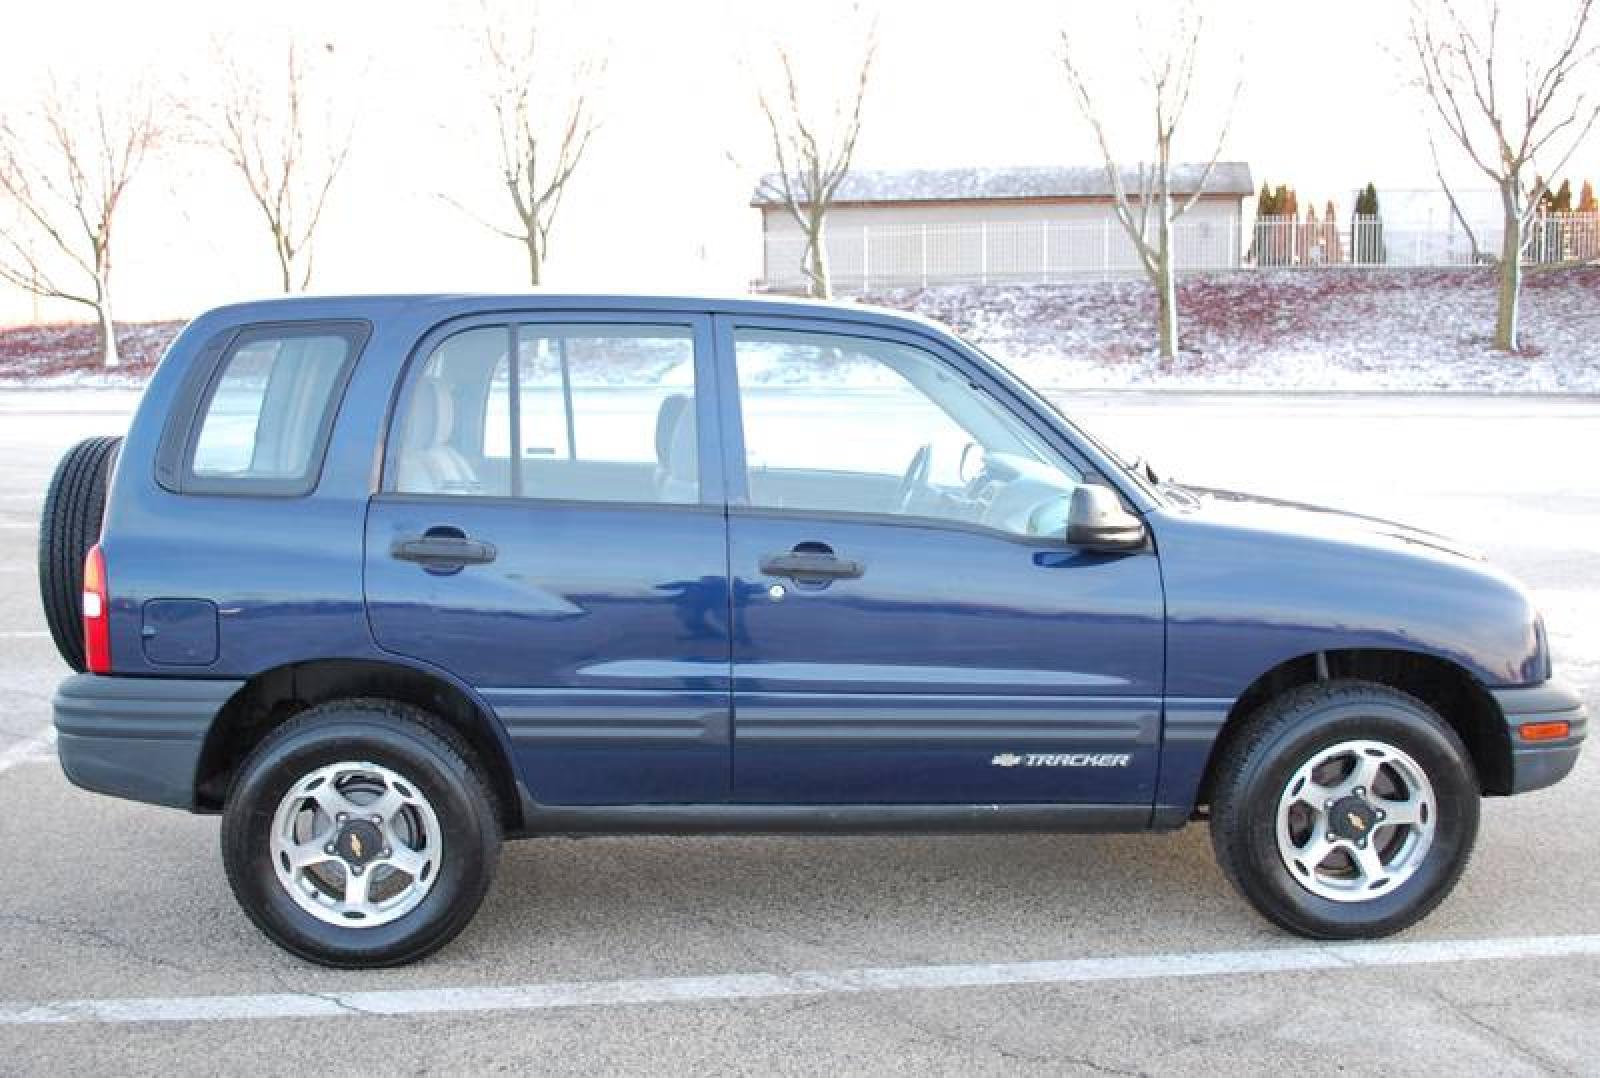 2000 Chevrolet Tracker #10 Chevrolet Tracker #10 800 1024 1280 1600 origin  ...